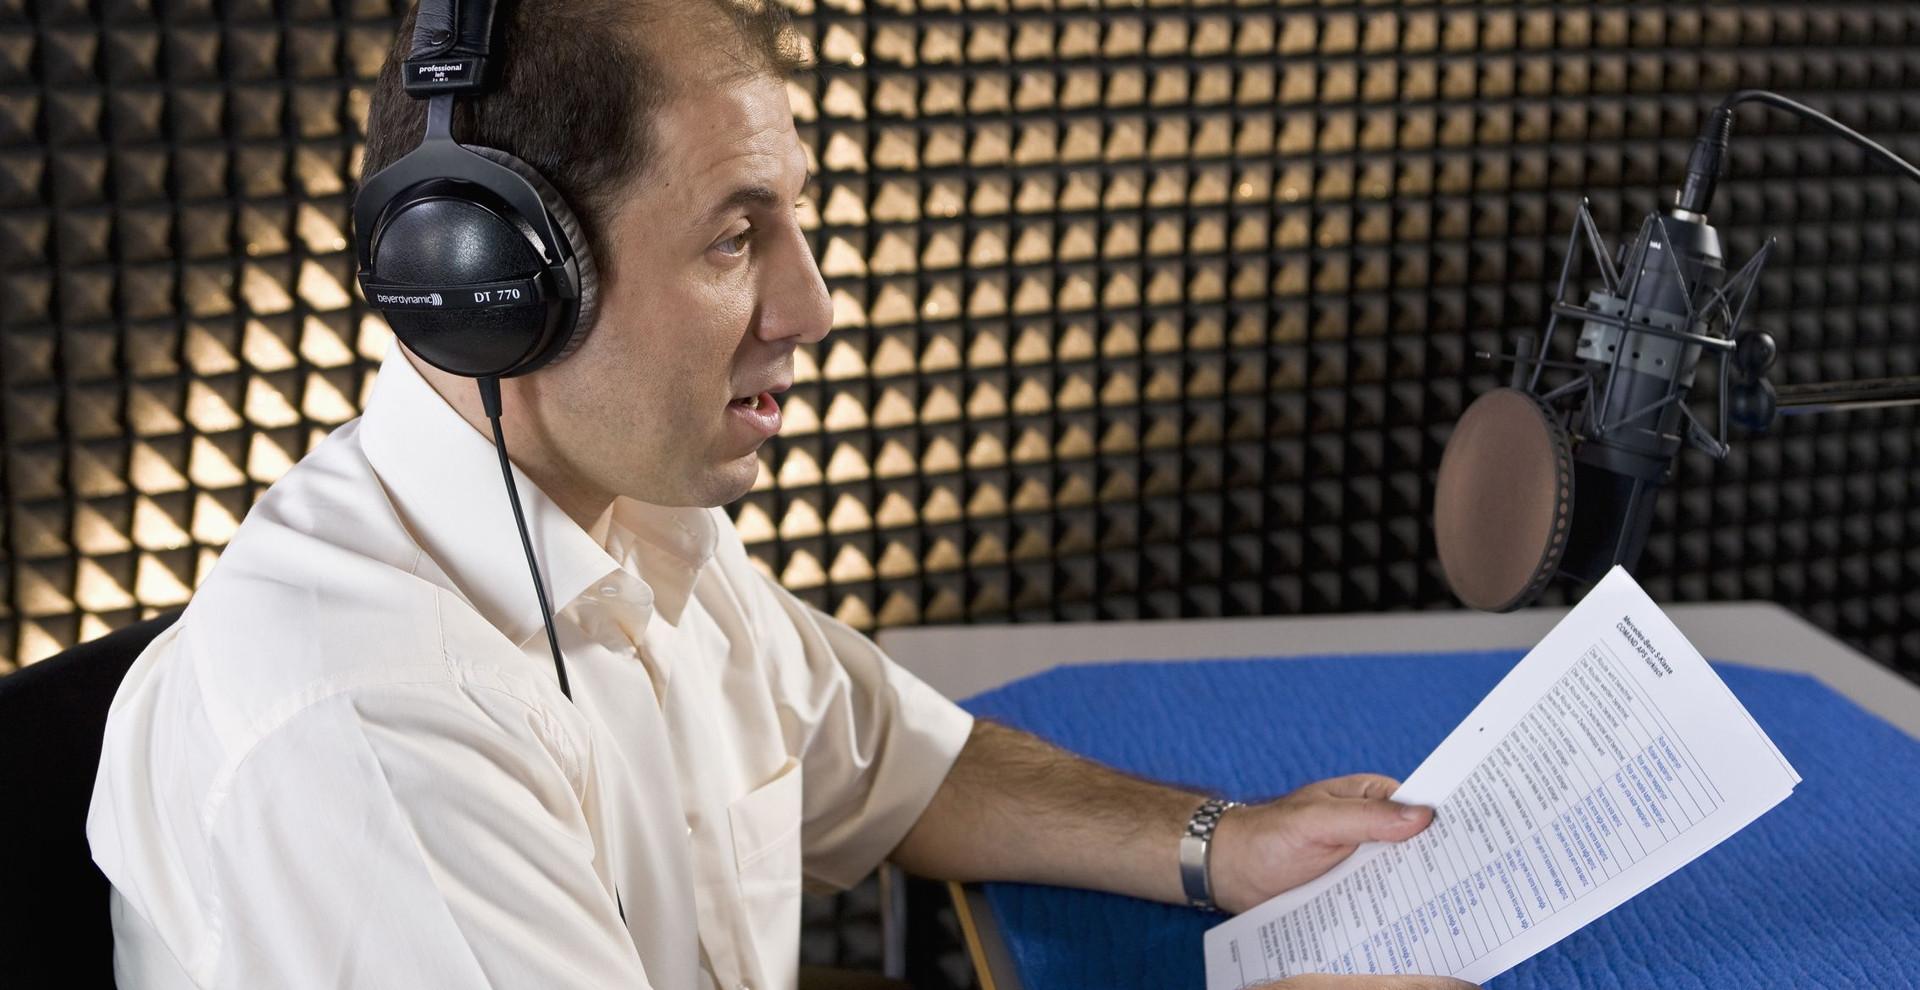 Navigation voice over - Selcuk Birdal